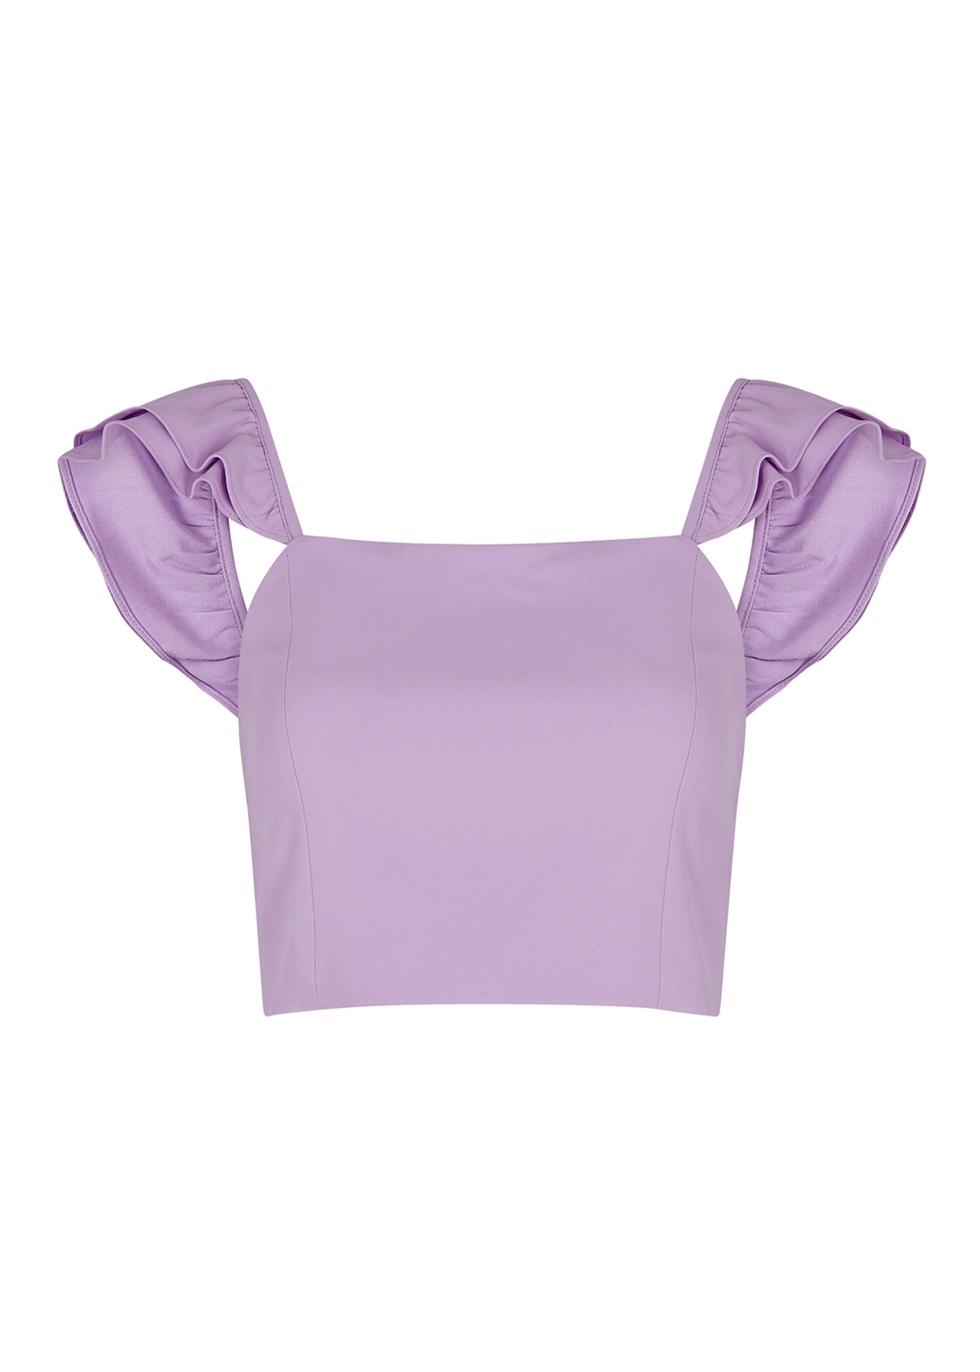 28f1ef5bae4 Women's Designer Tops - Lace & Silk - Harvey Nichols